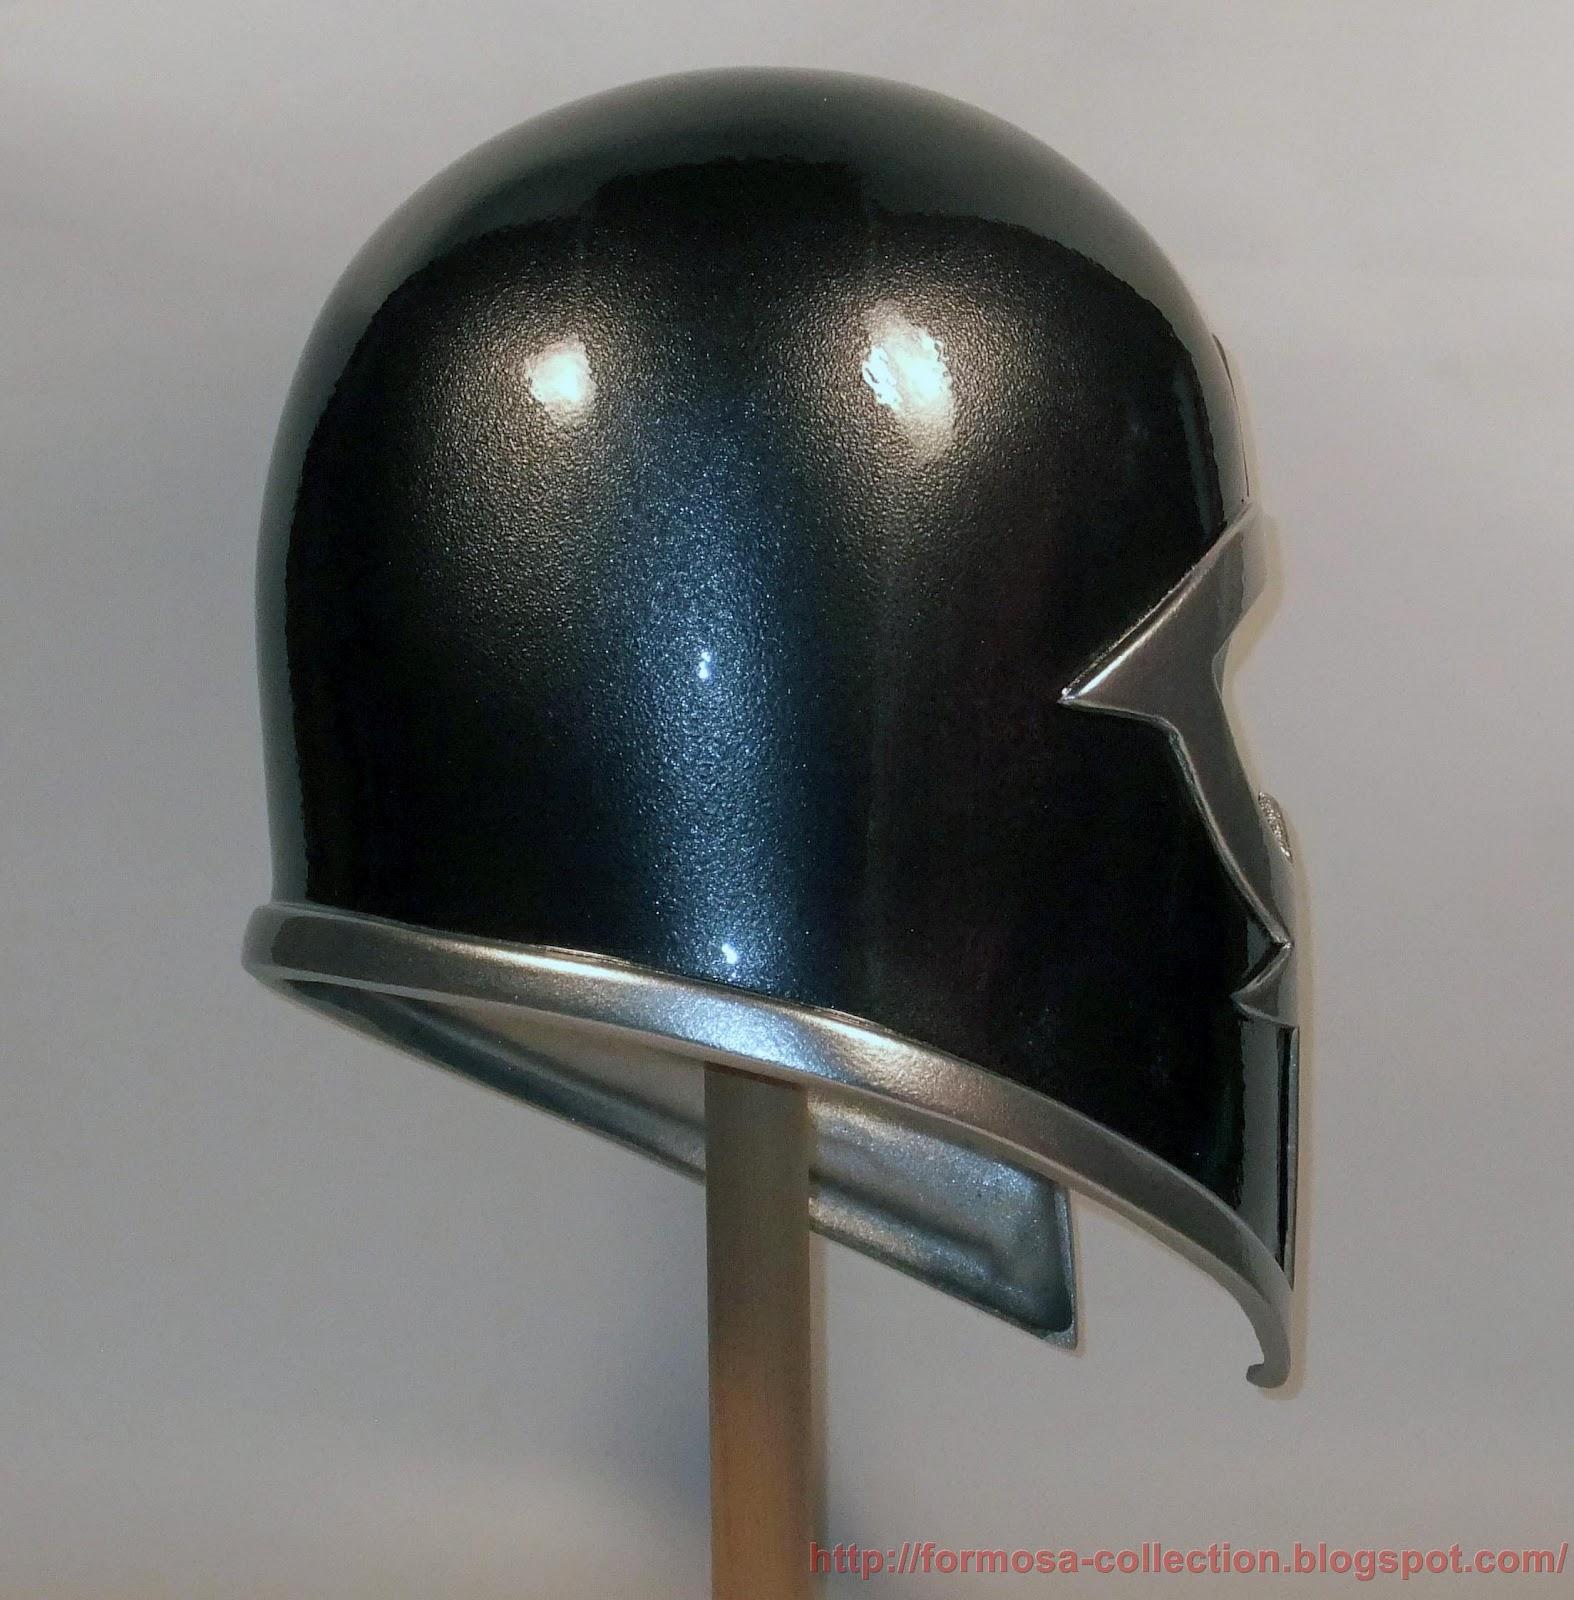 Formosa-Collection: X-Men First Class Shaw helmet